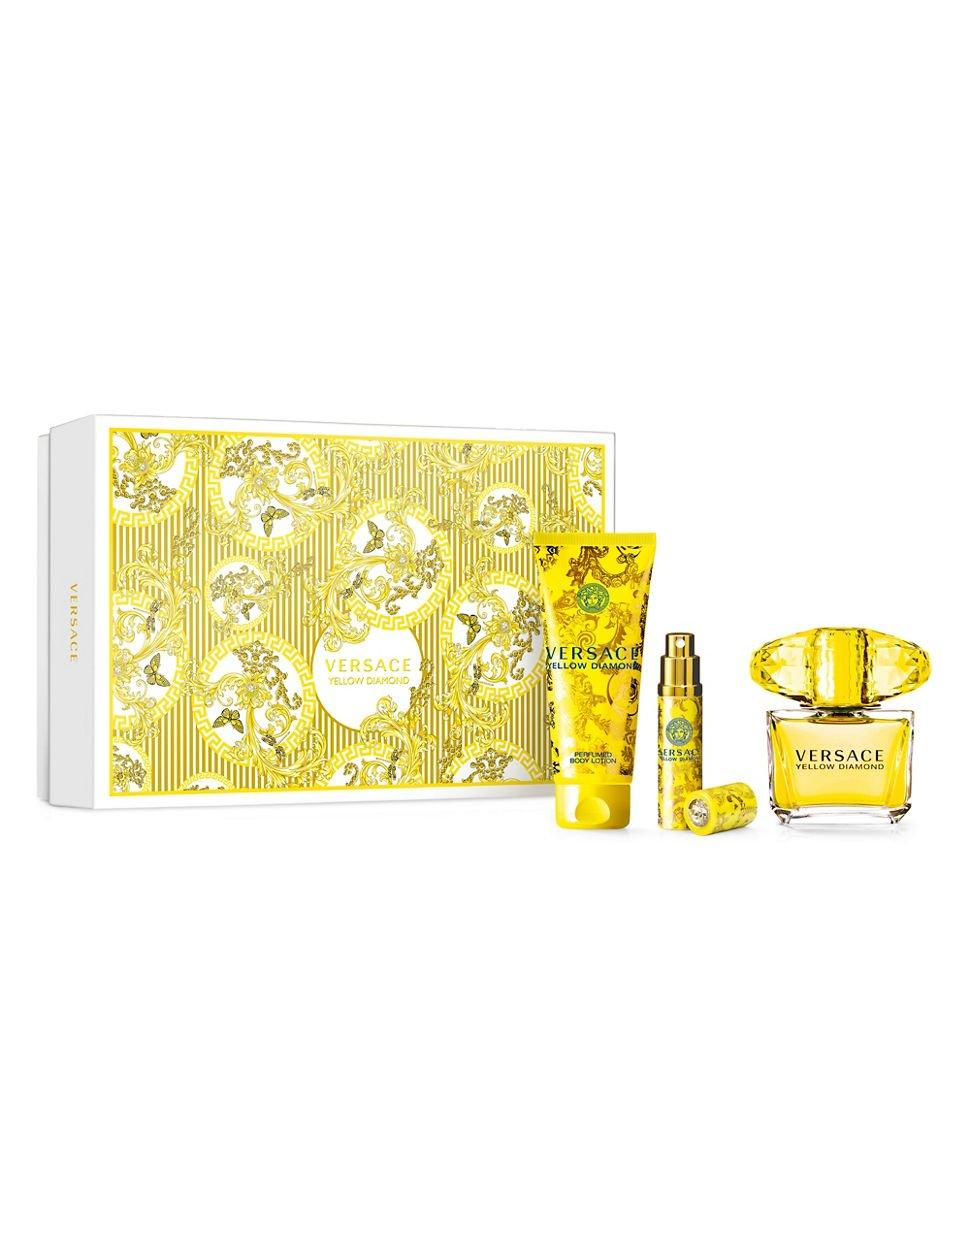 Versace Yellow Diamond 3 Piece Set For Women